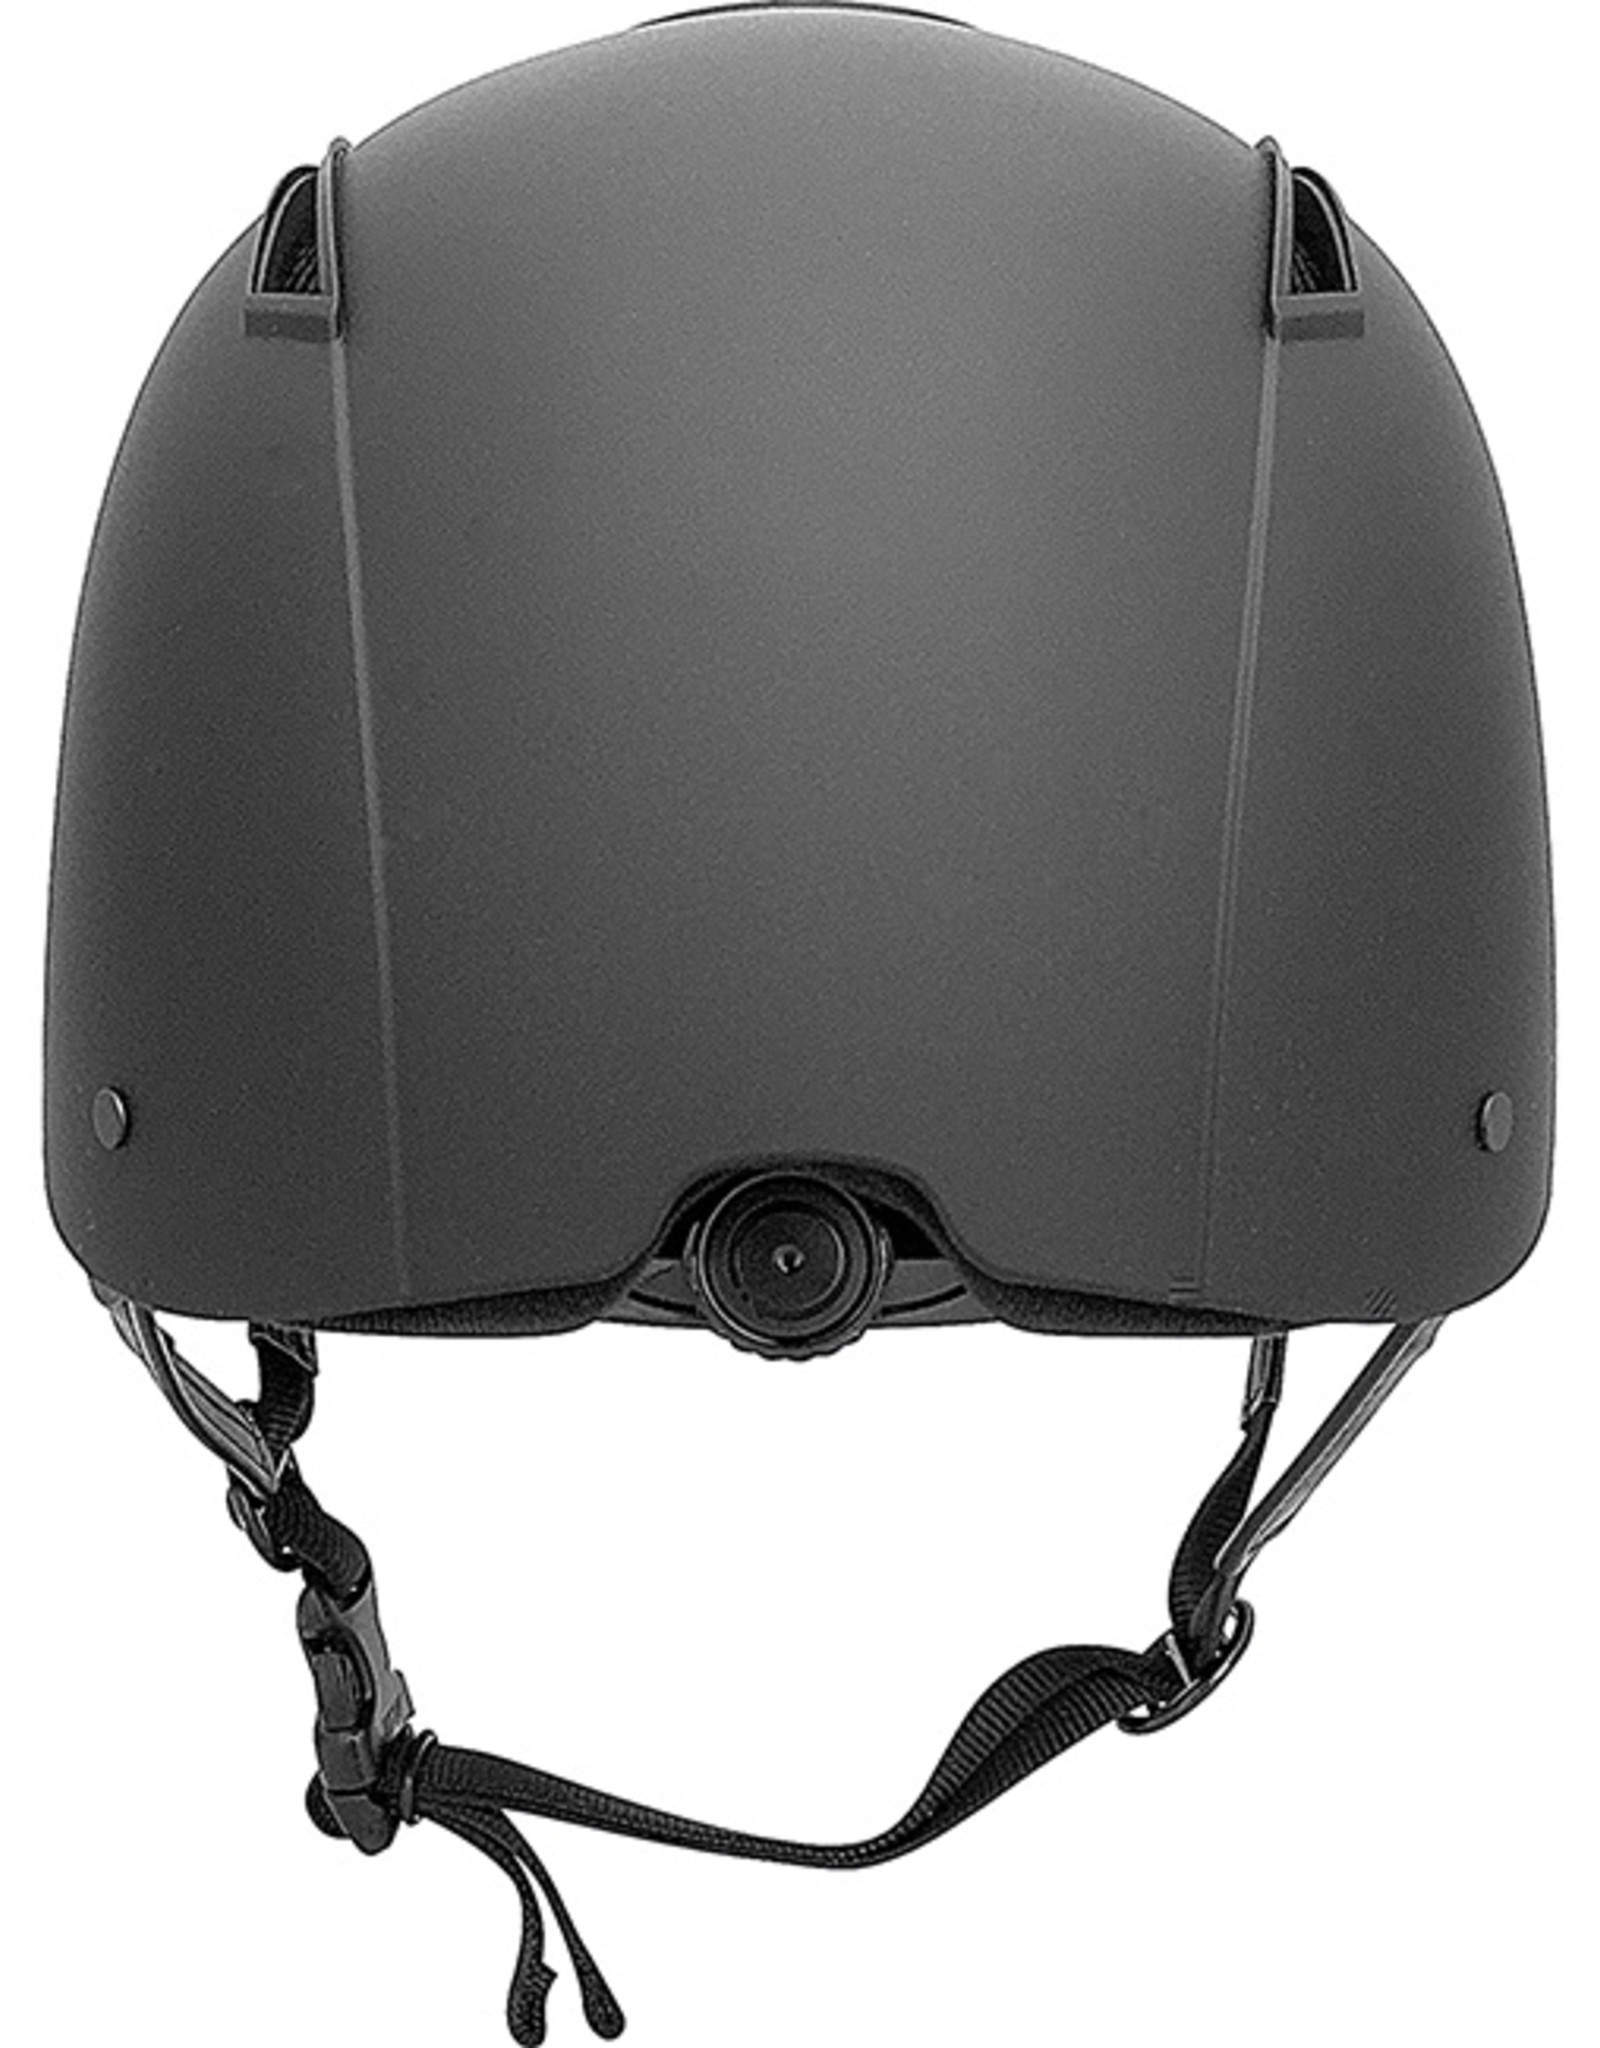 International Riding Helmets IRH Equi-Pro Helmet